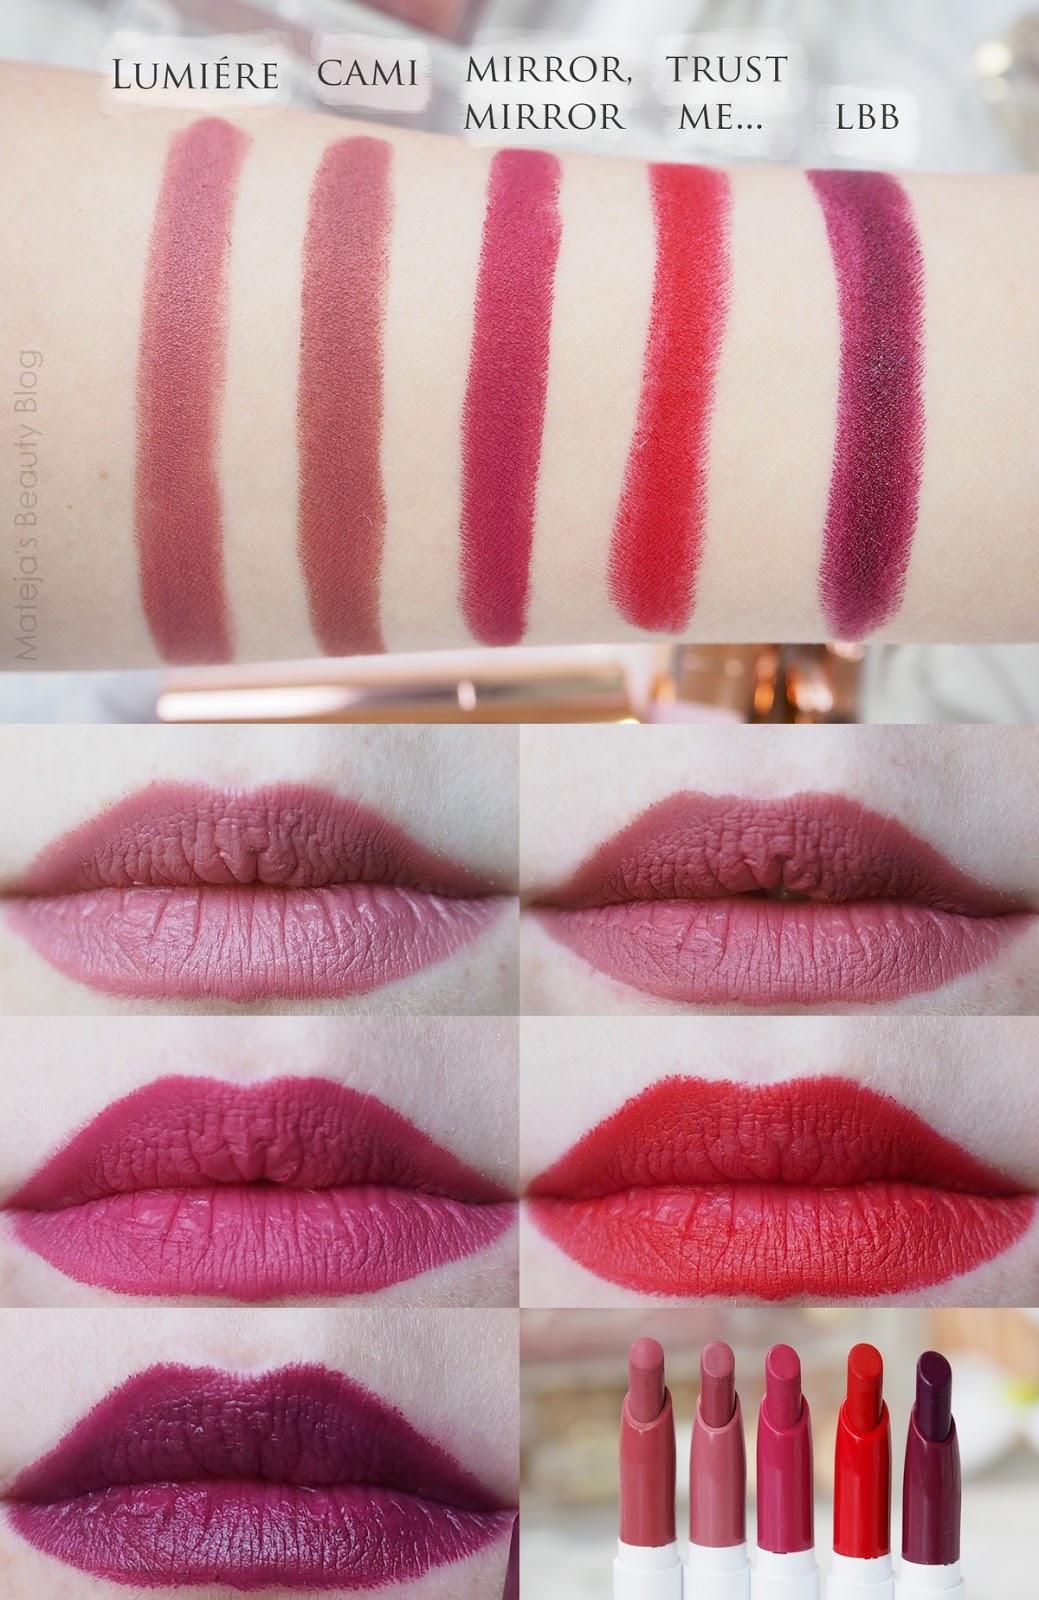 Colourpop Cami : colourpop, Colourpop, Lippie, Matte, Mateja's, Beauty